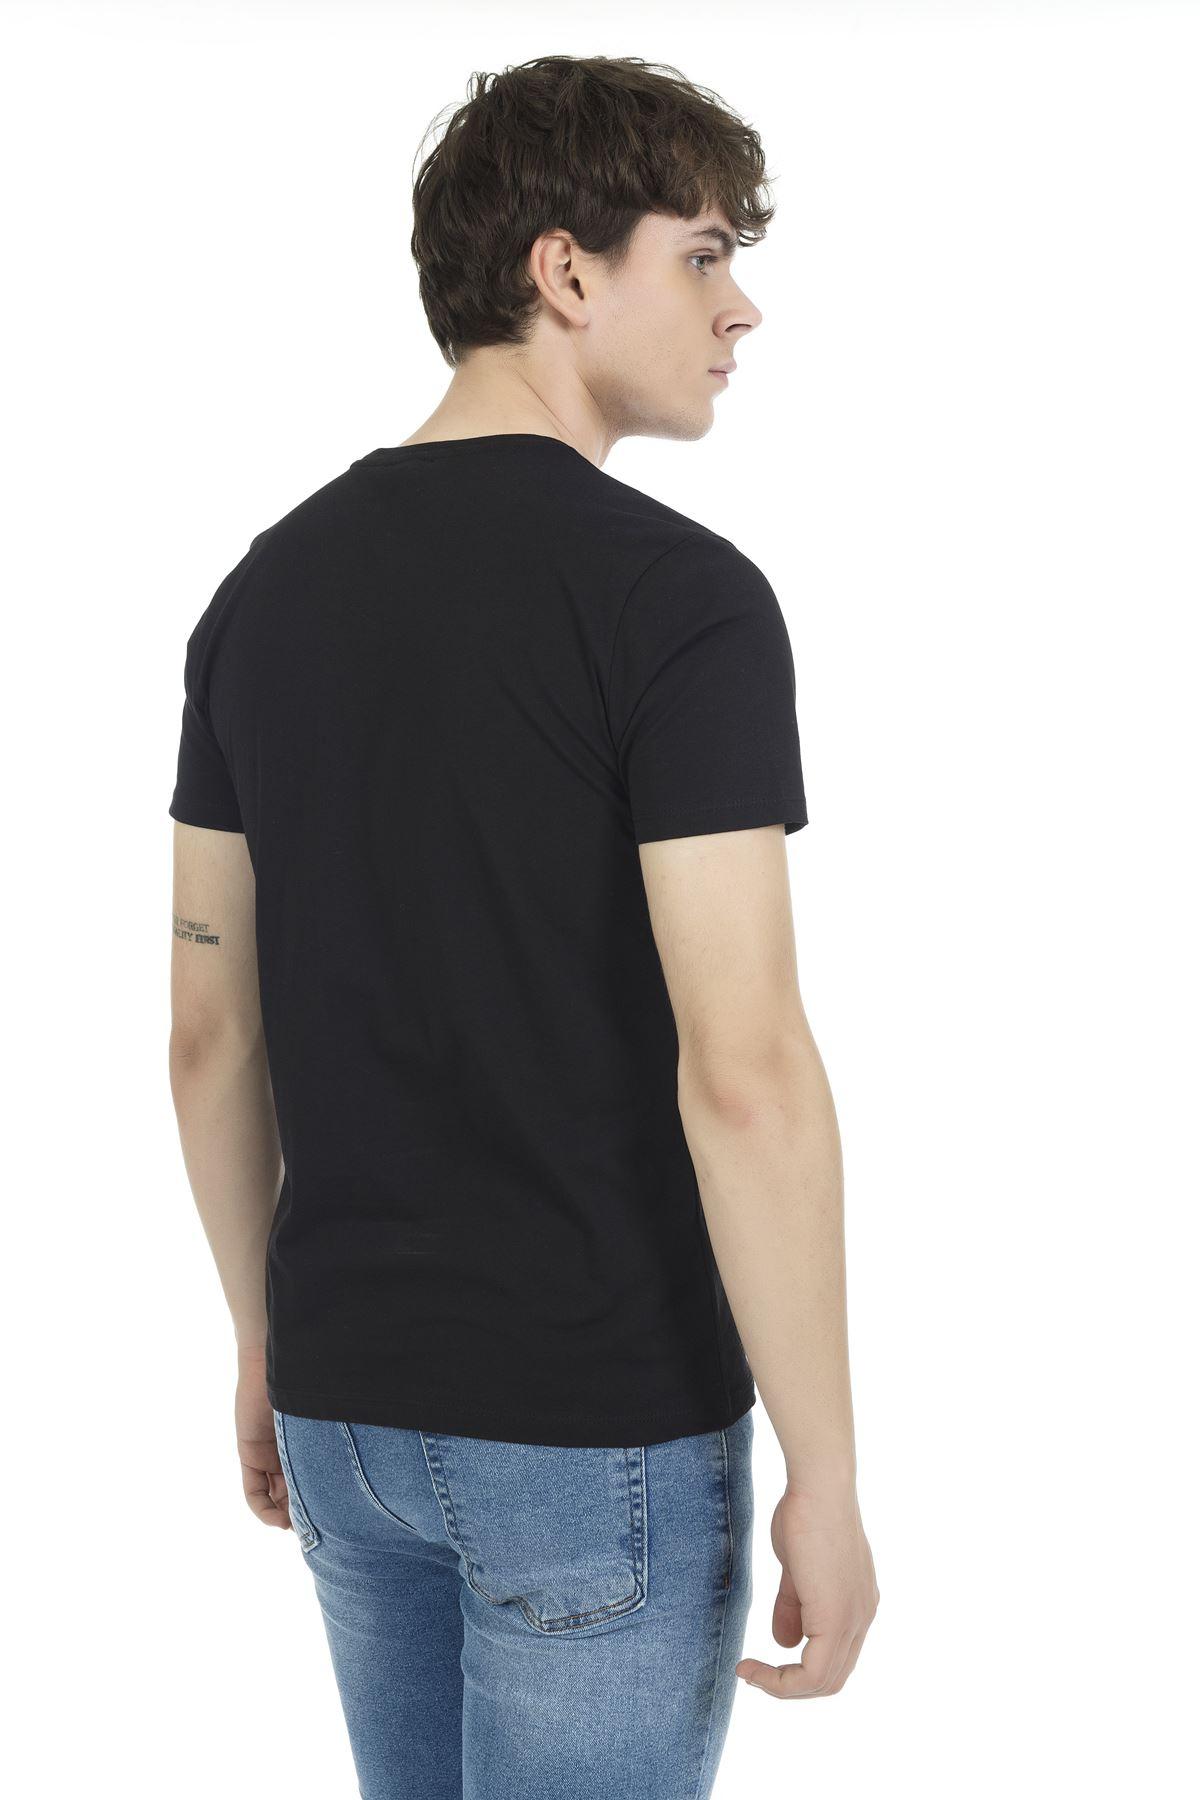 Siyah Bisiklet Yaka Kısa Kol Süpreme Baskılı Tshirt